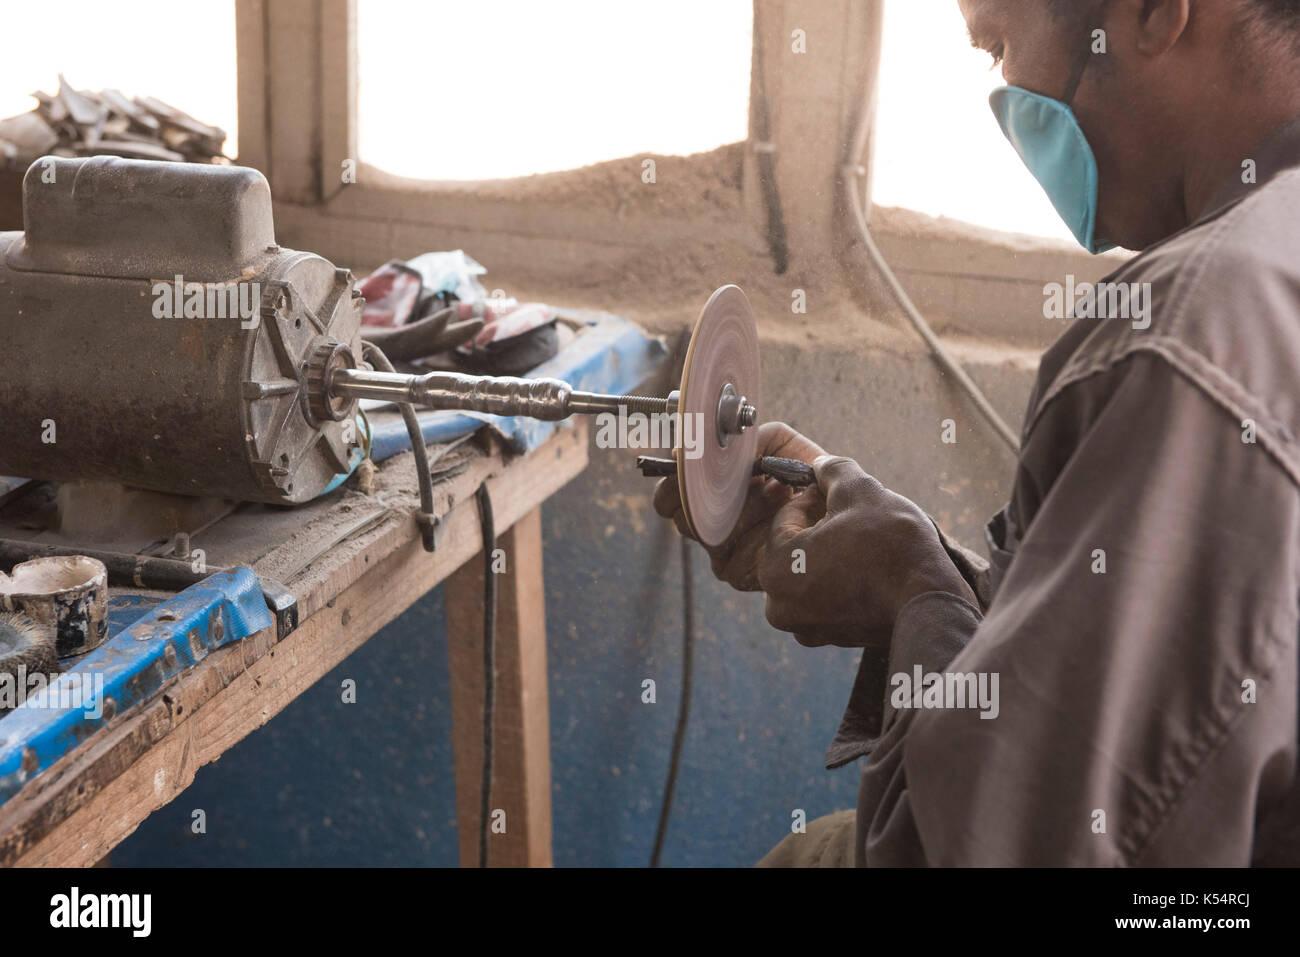 Artisan at work in zebu horn craft workshop, Maminirina cornet des zebu, Antsirabe, Madagascar - Stock Image